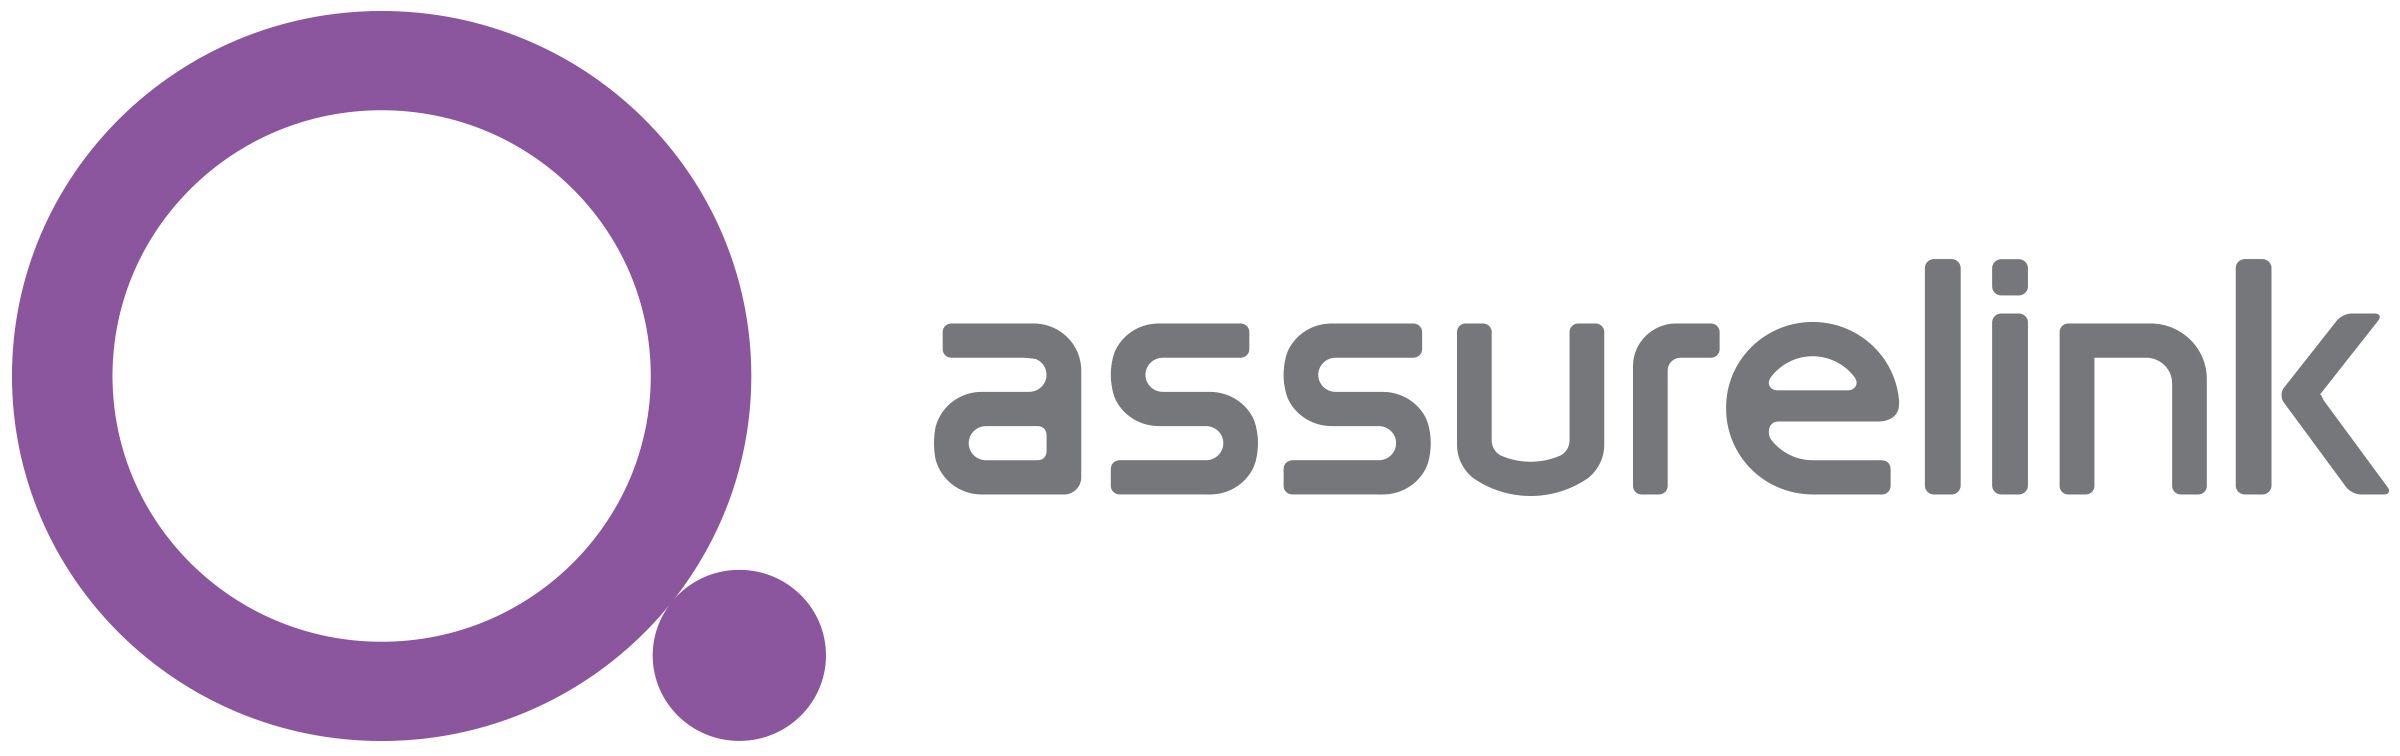 Assurelink Company Limited